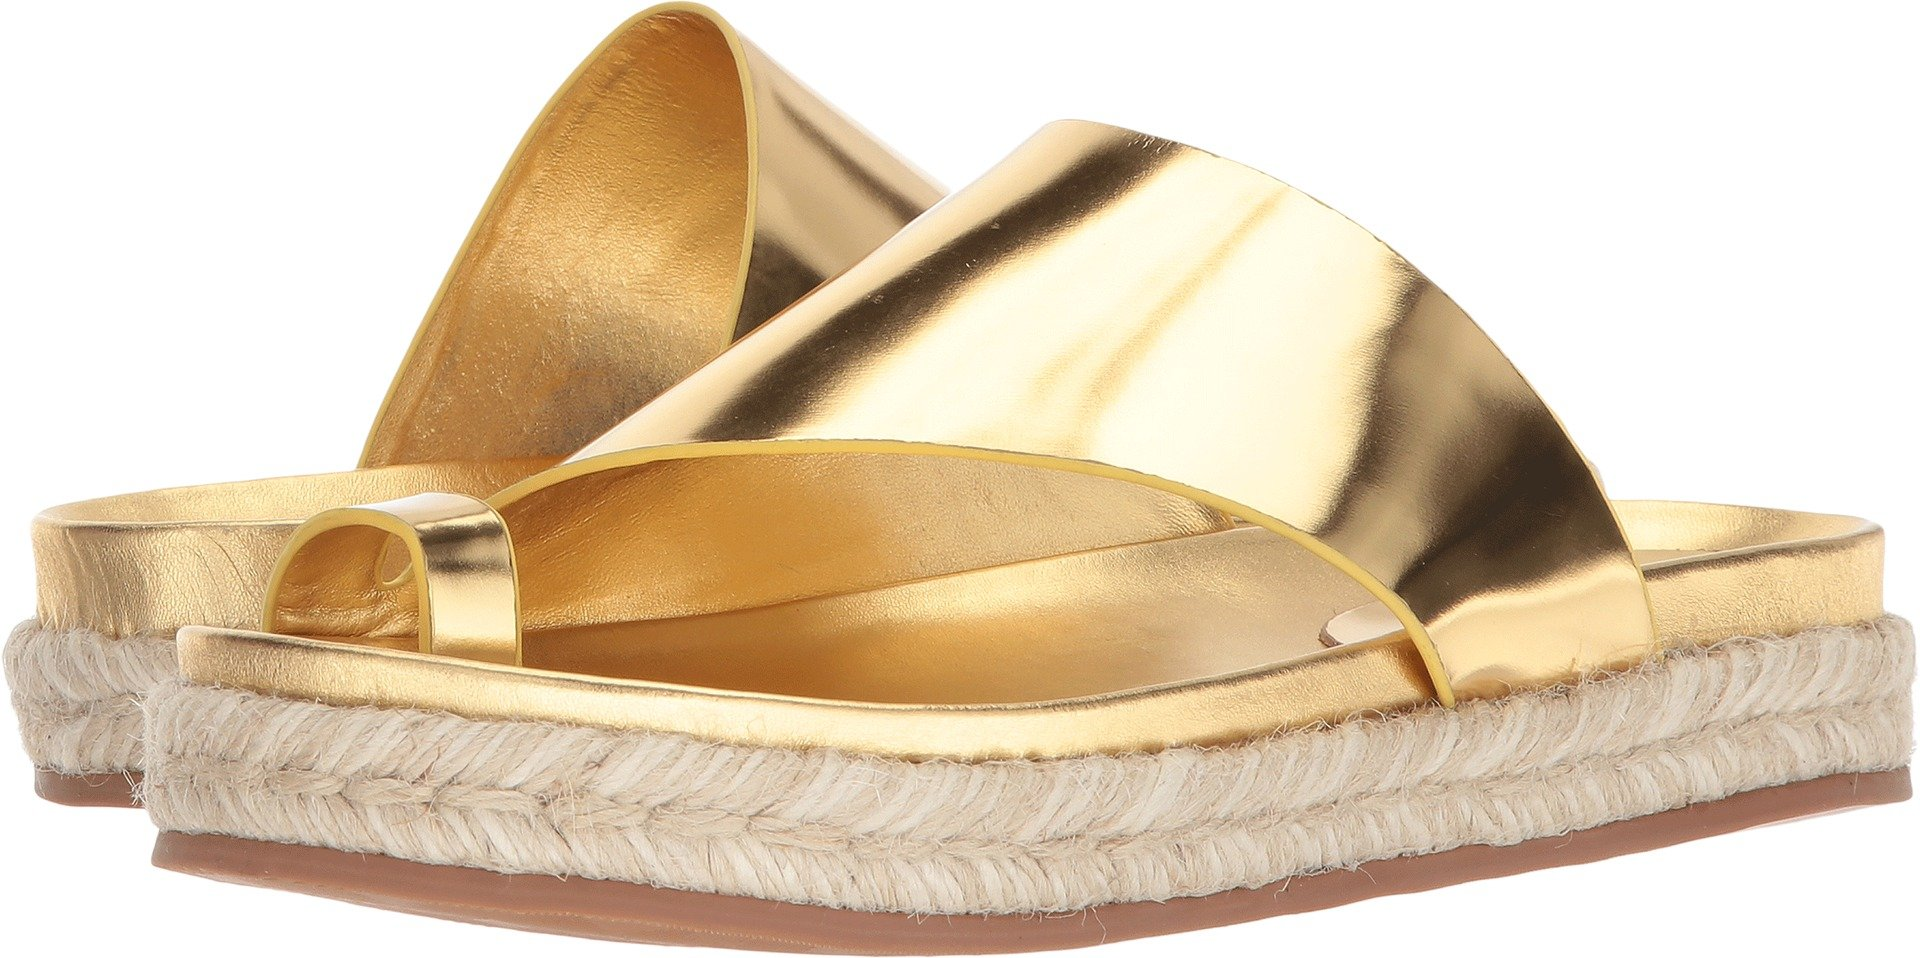 Sigerson Morrison Women's Laddie Gold Super Glass 9 M US